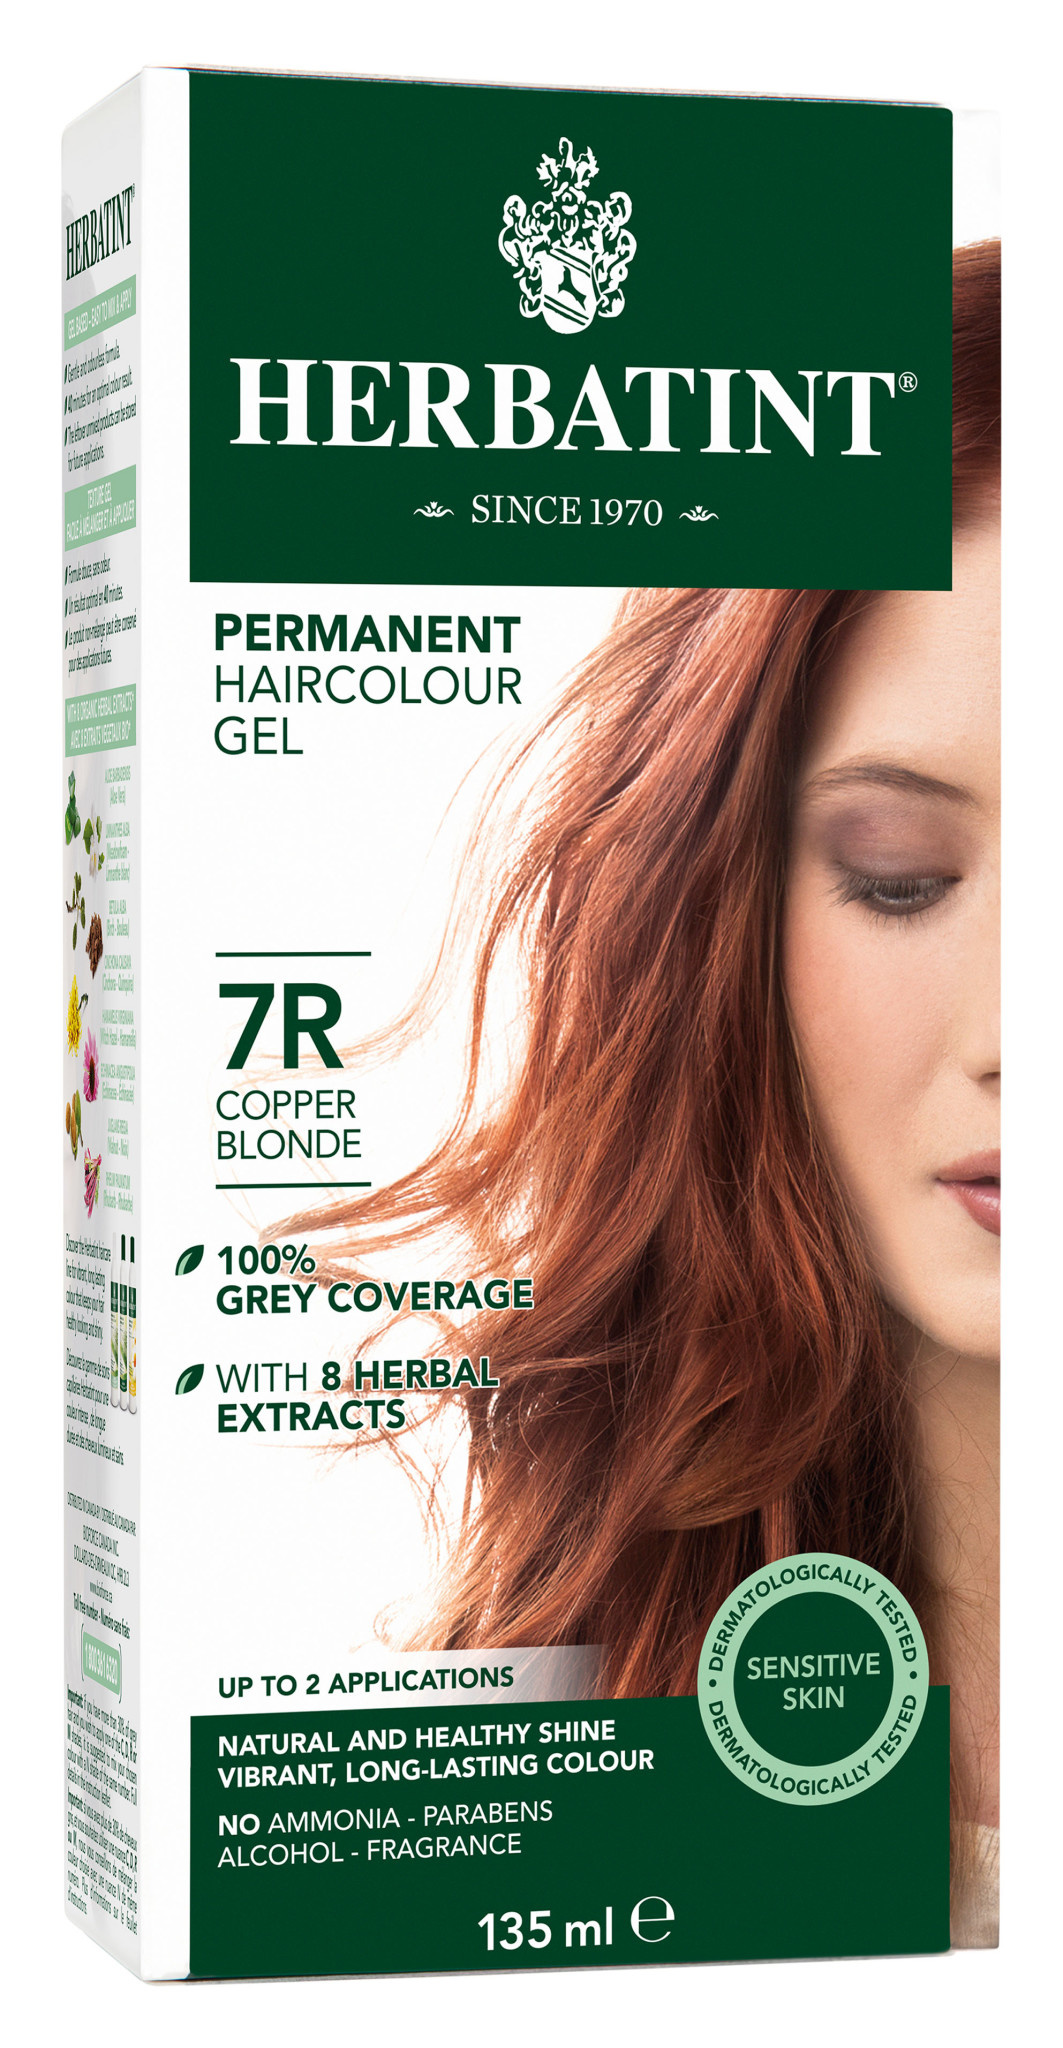 Herbatint - 7R - Copper Blonde - 135ml